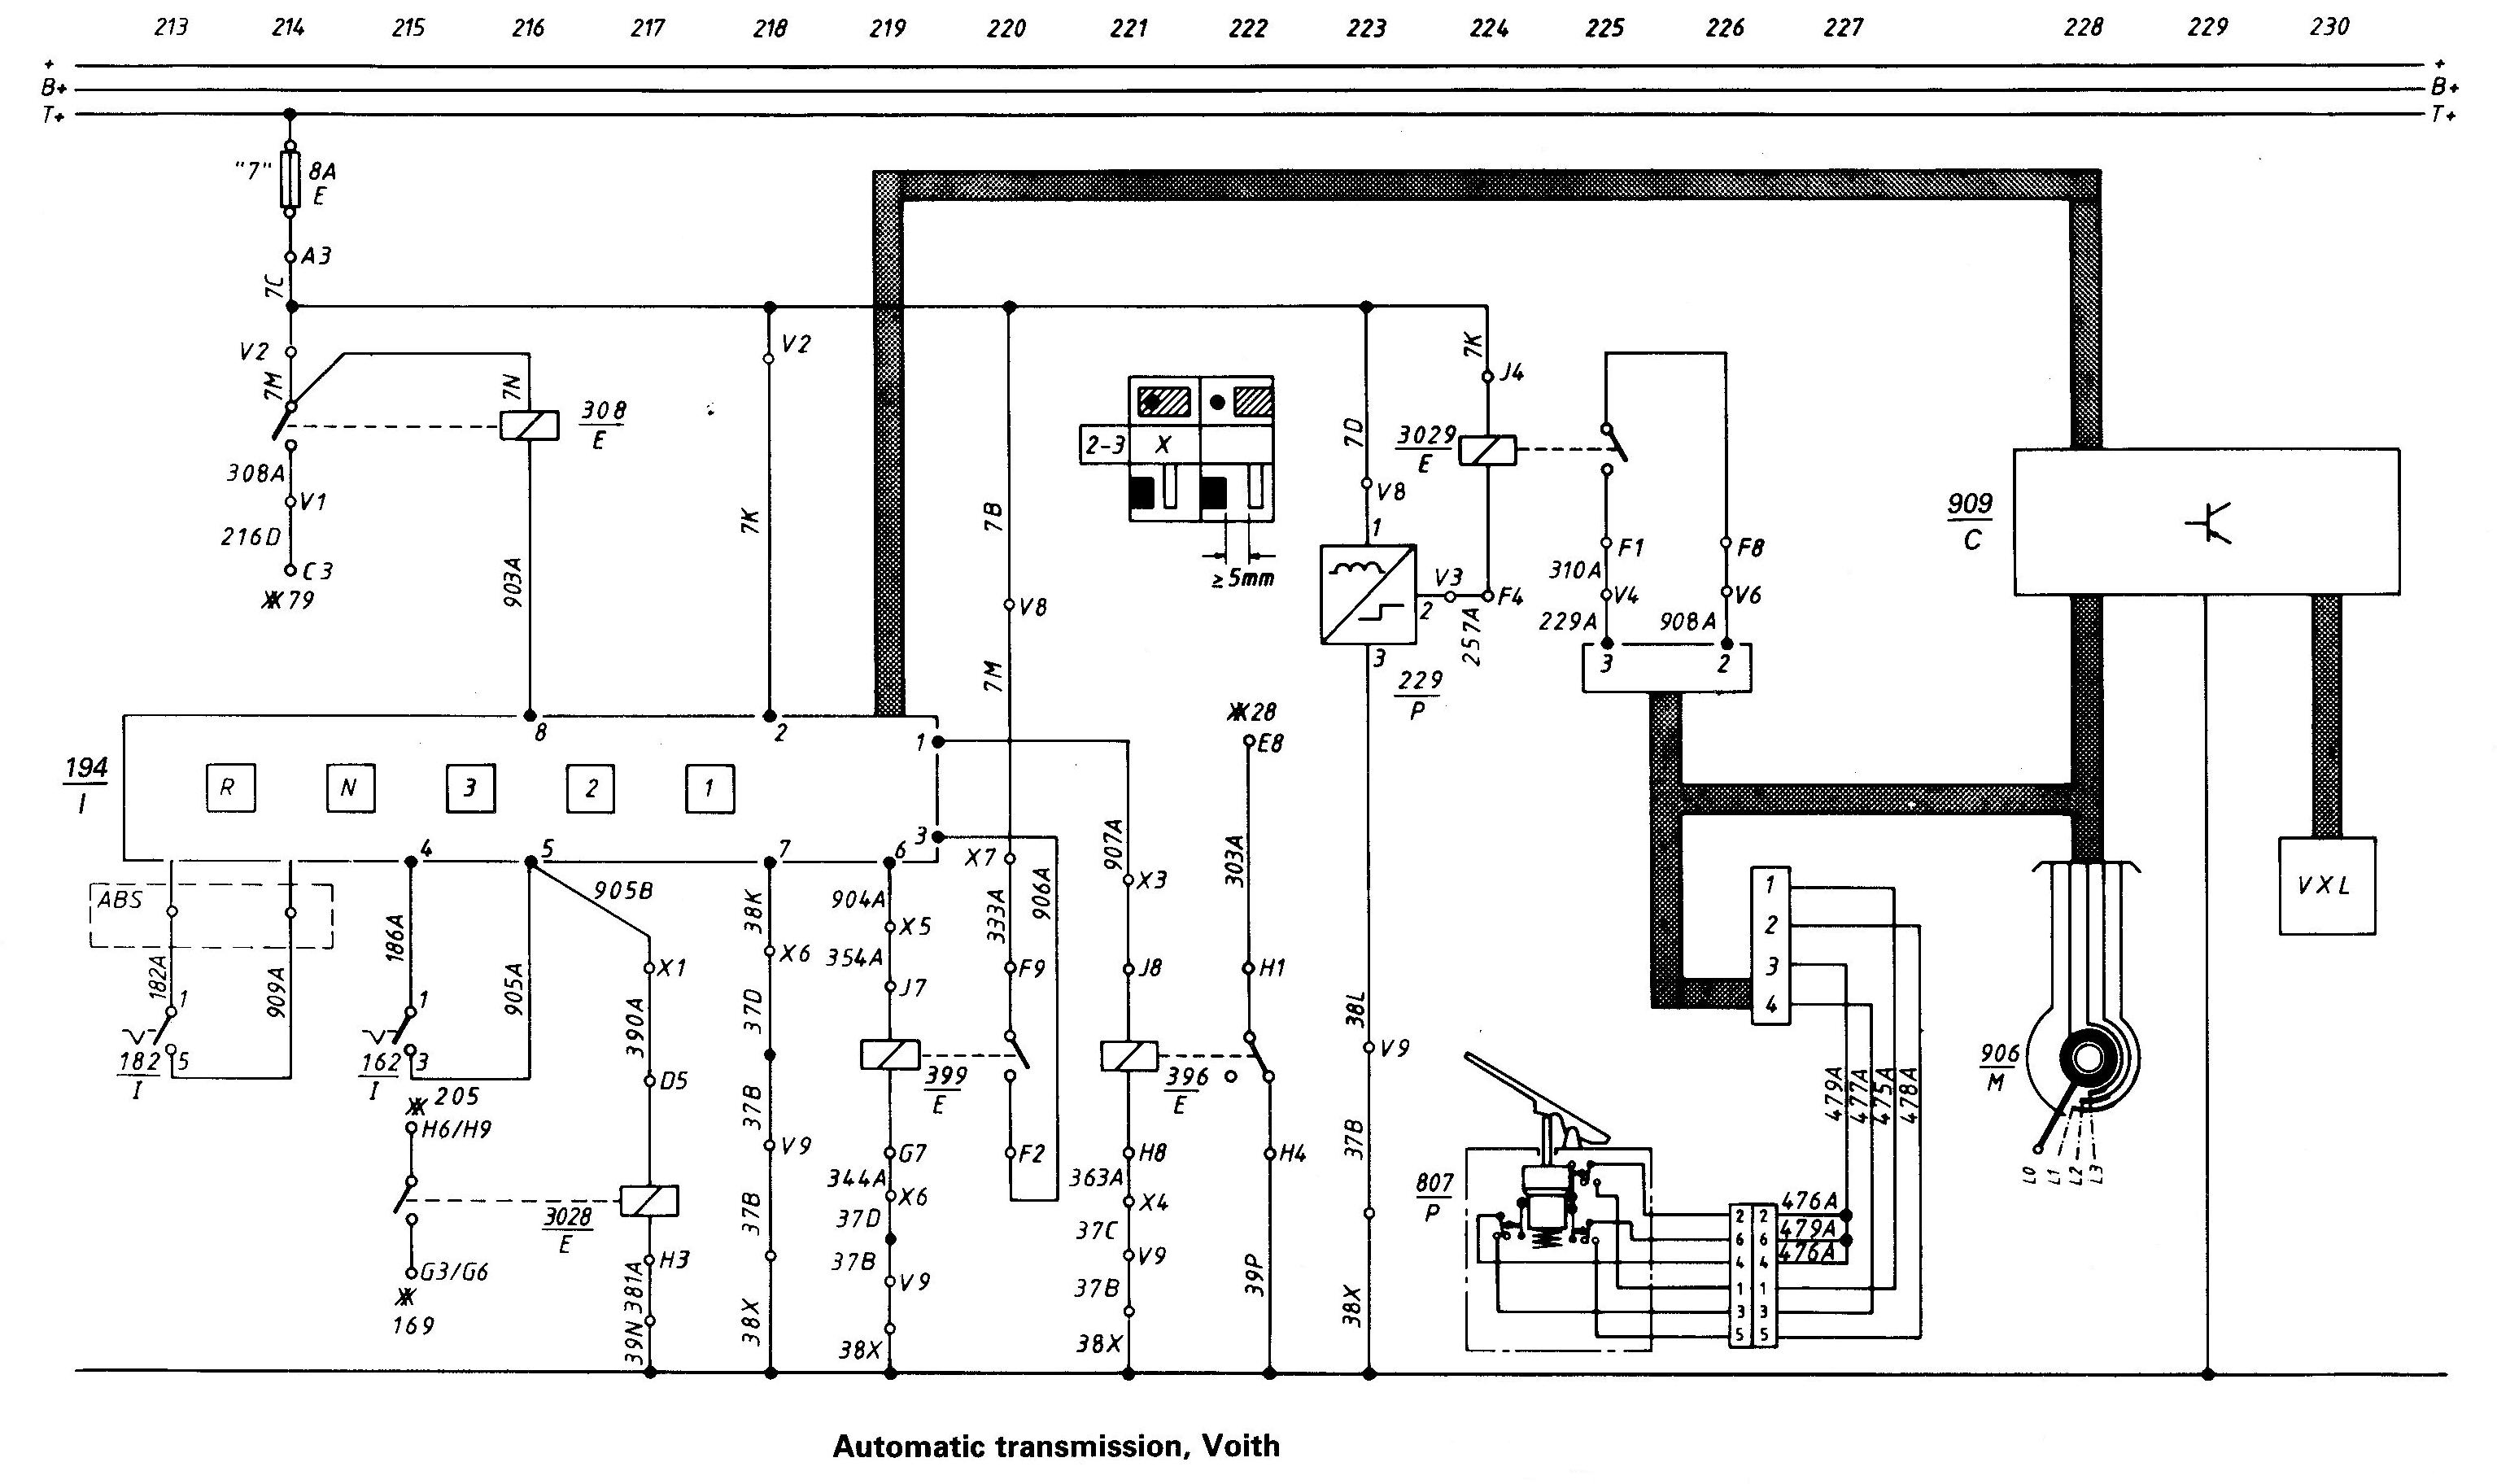 Voith Gearbox Wiring Diagram